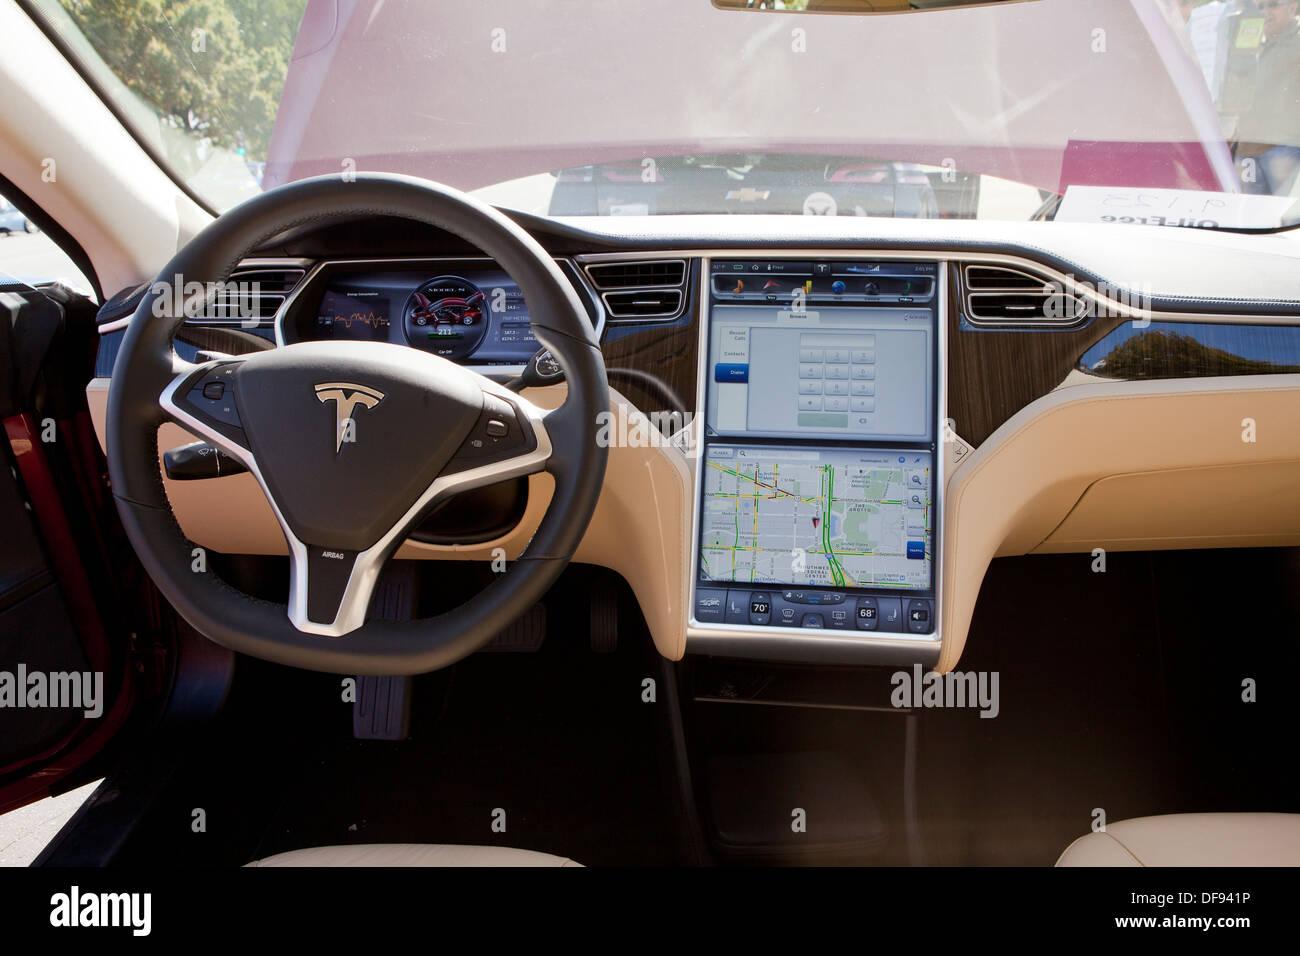 Tesla Model S electric car interior Stock Photo: 61051698 - Alamy